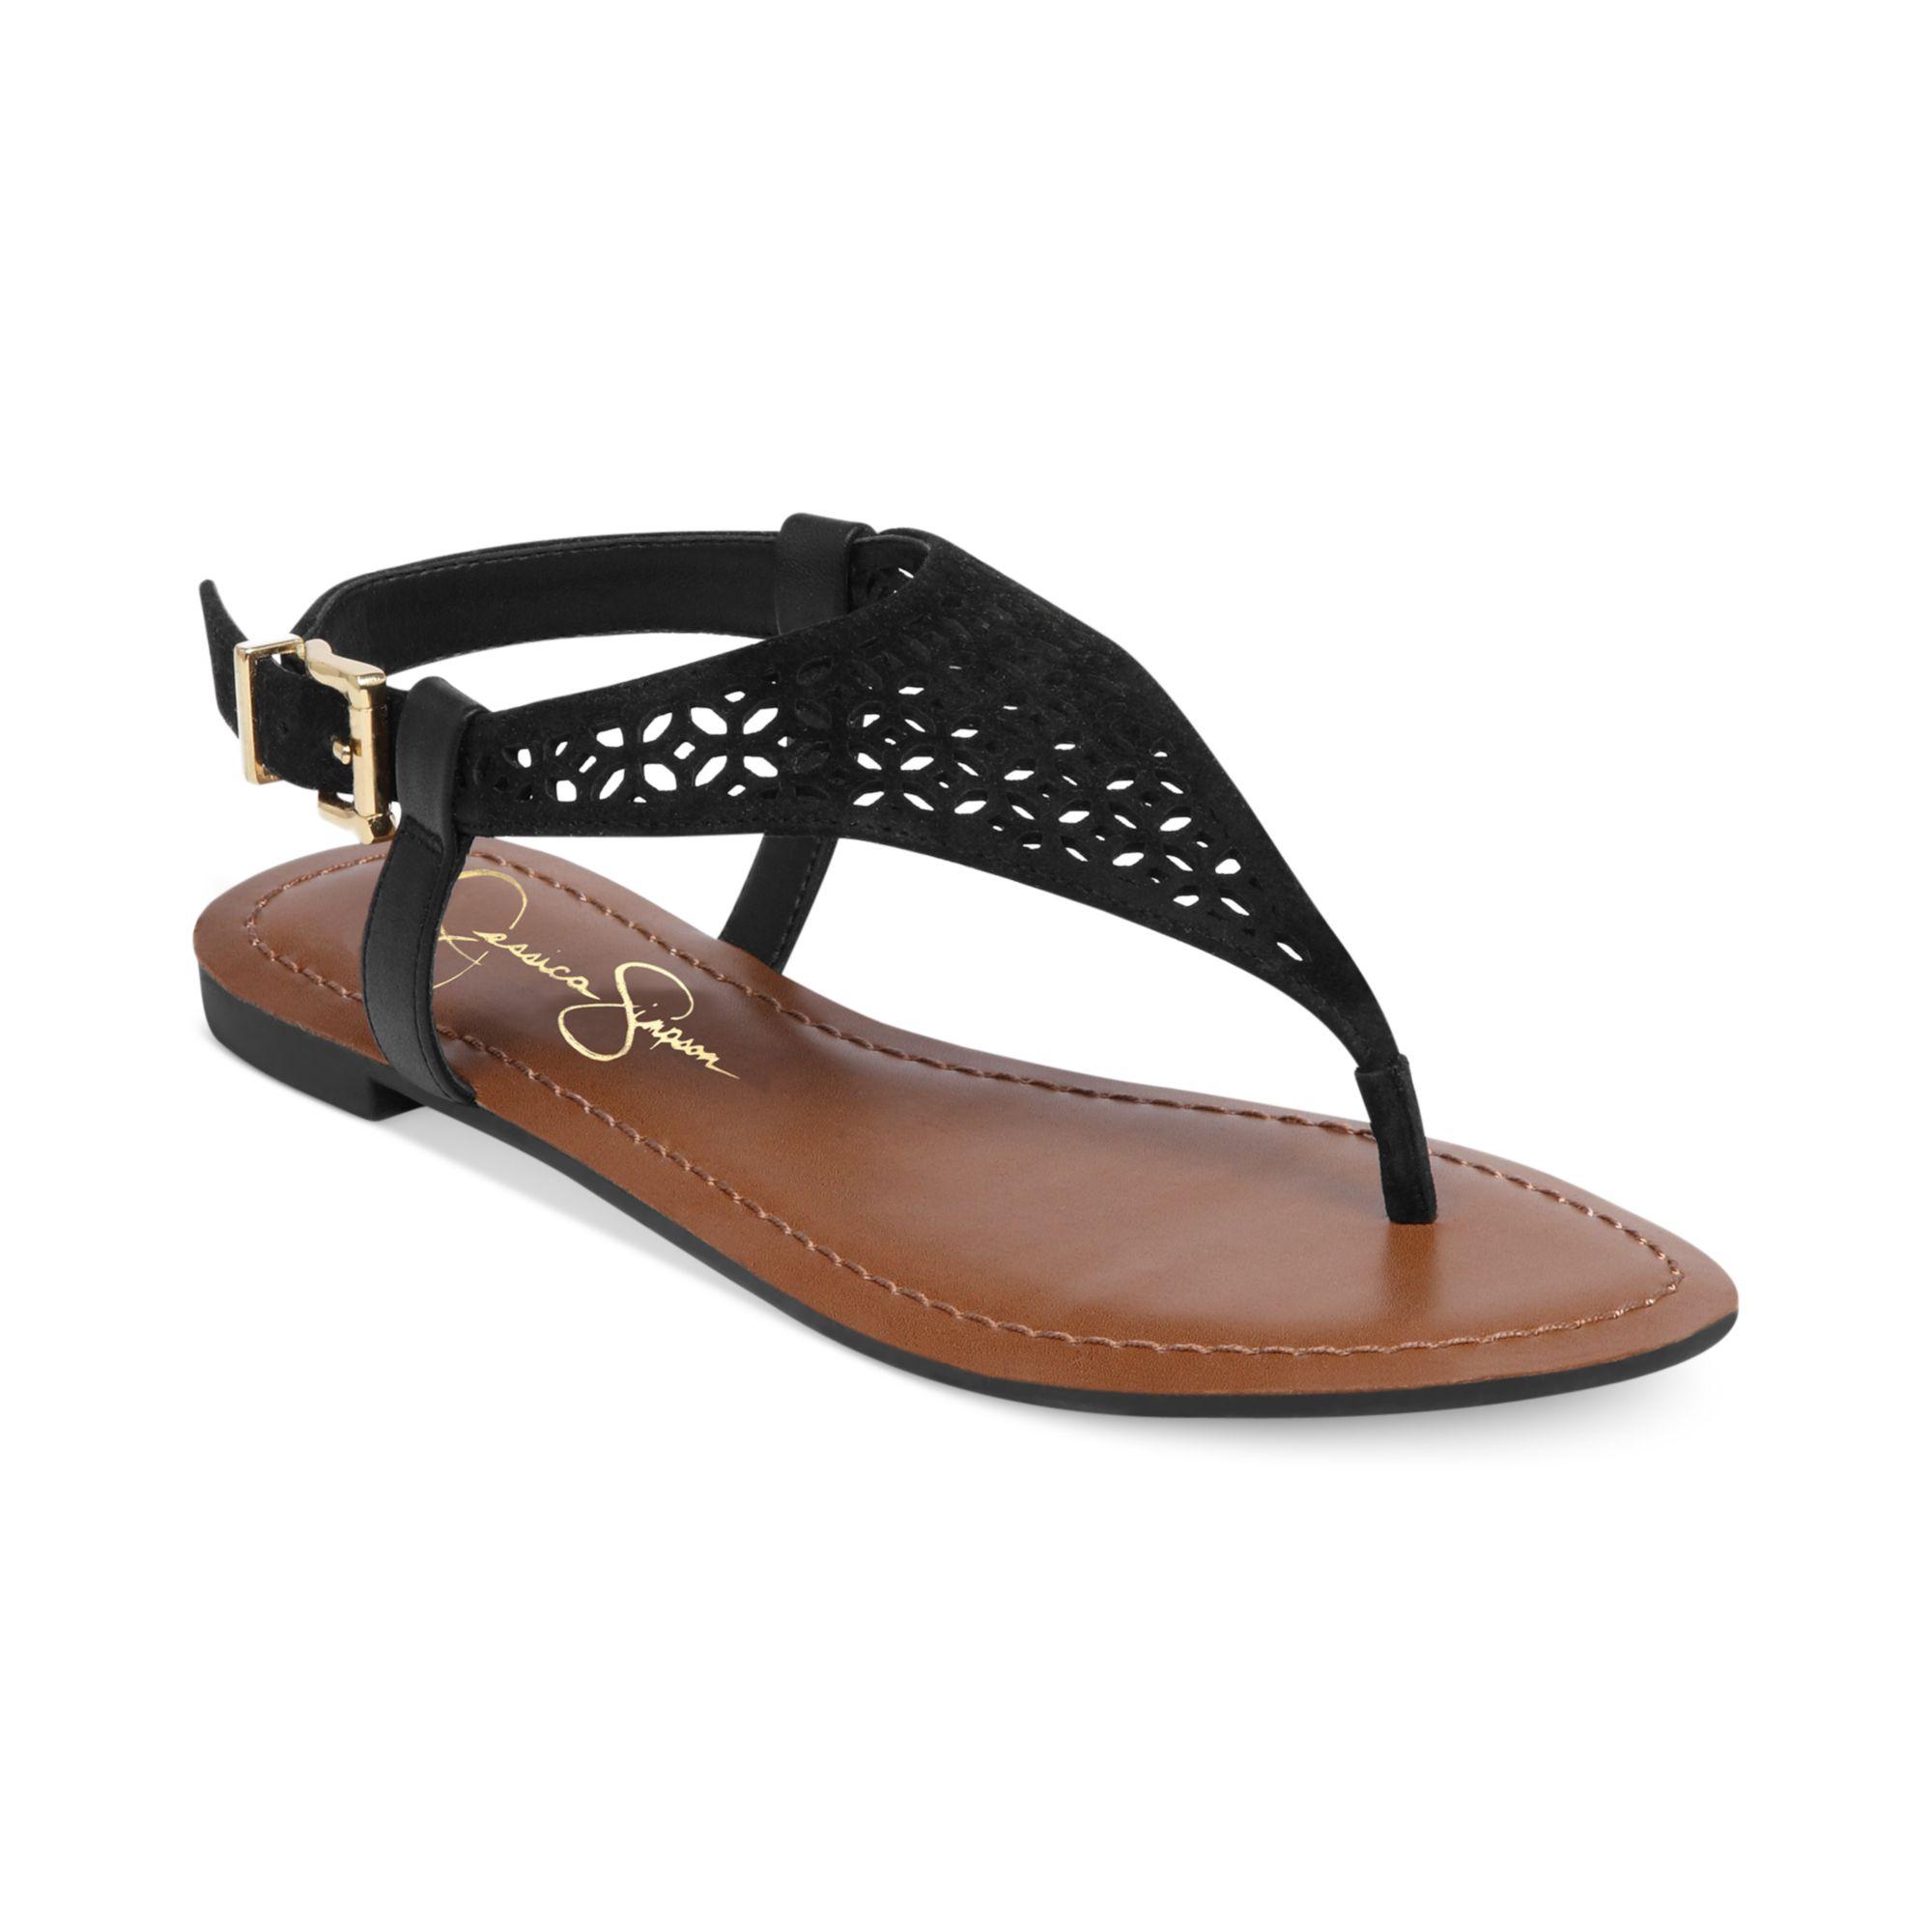 Jessica Simpson Flat Thong Sandal JGuobbemA